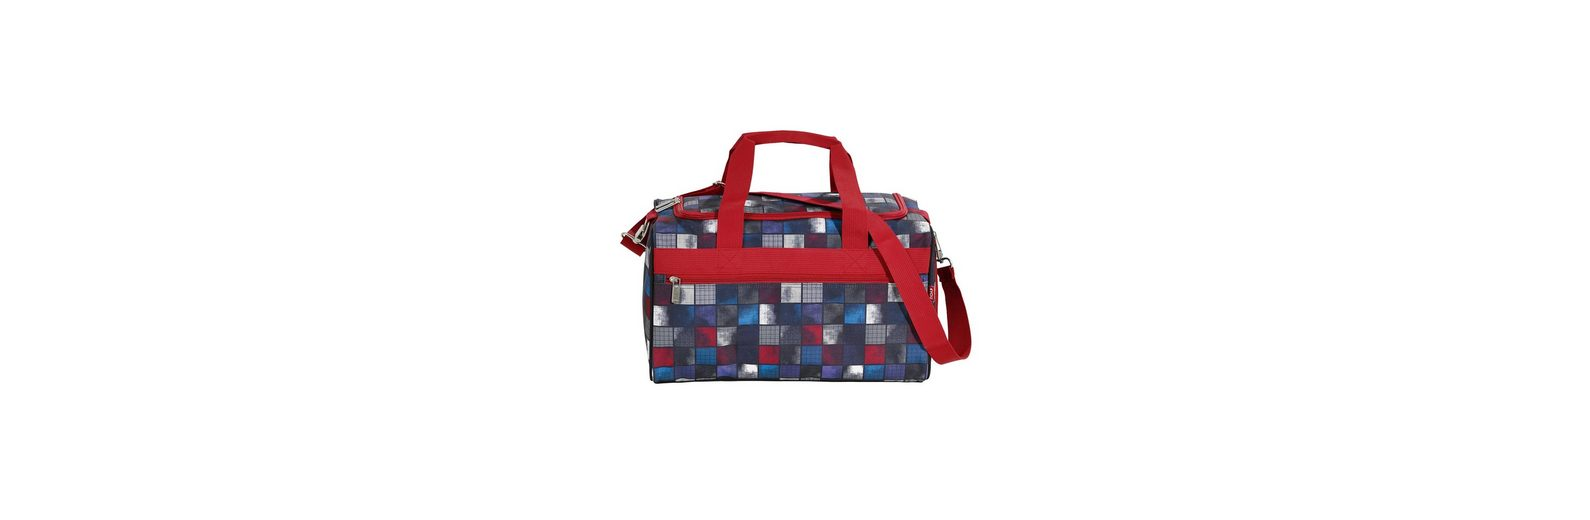 4YOU Sporttasche, Square Blue/Red, »Sportbag M«